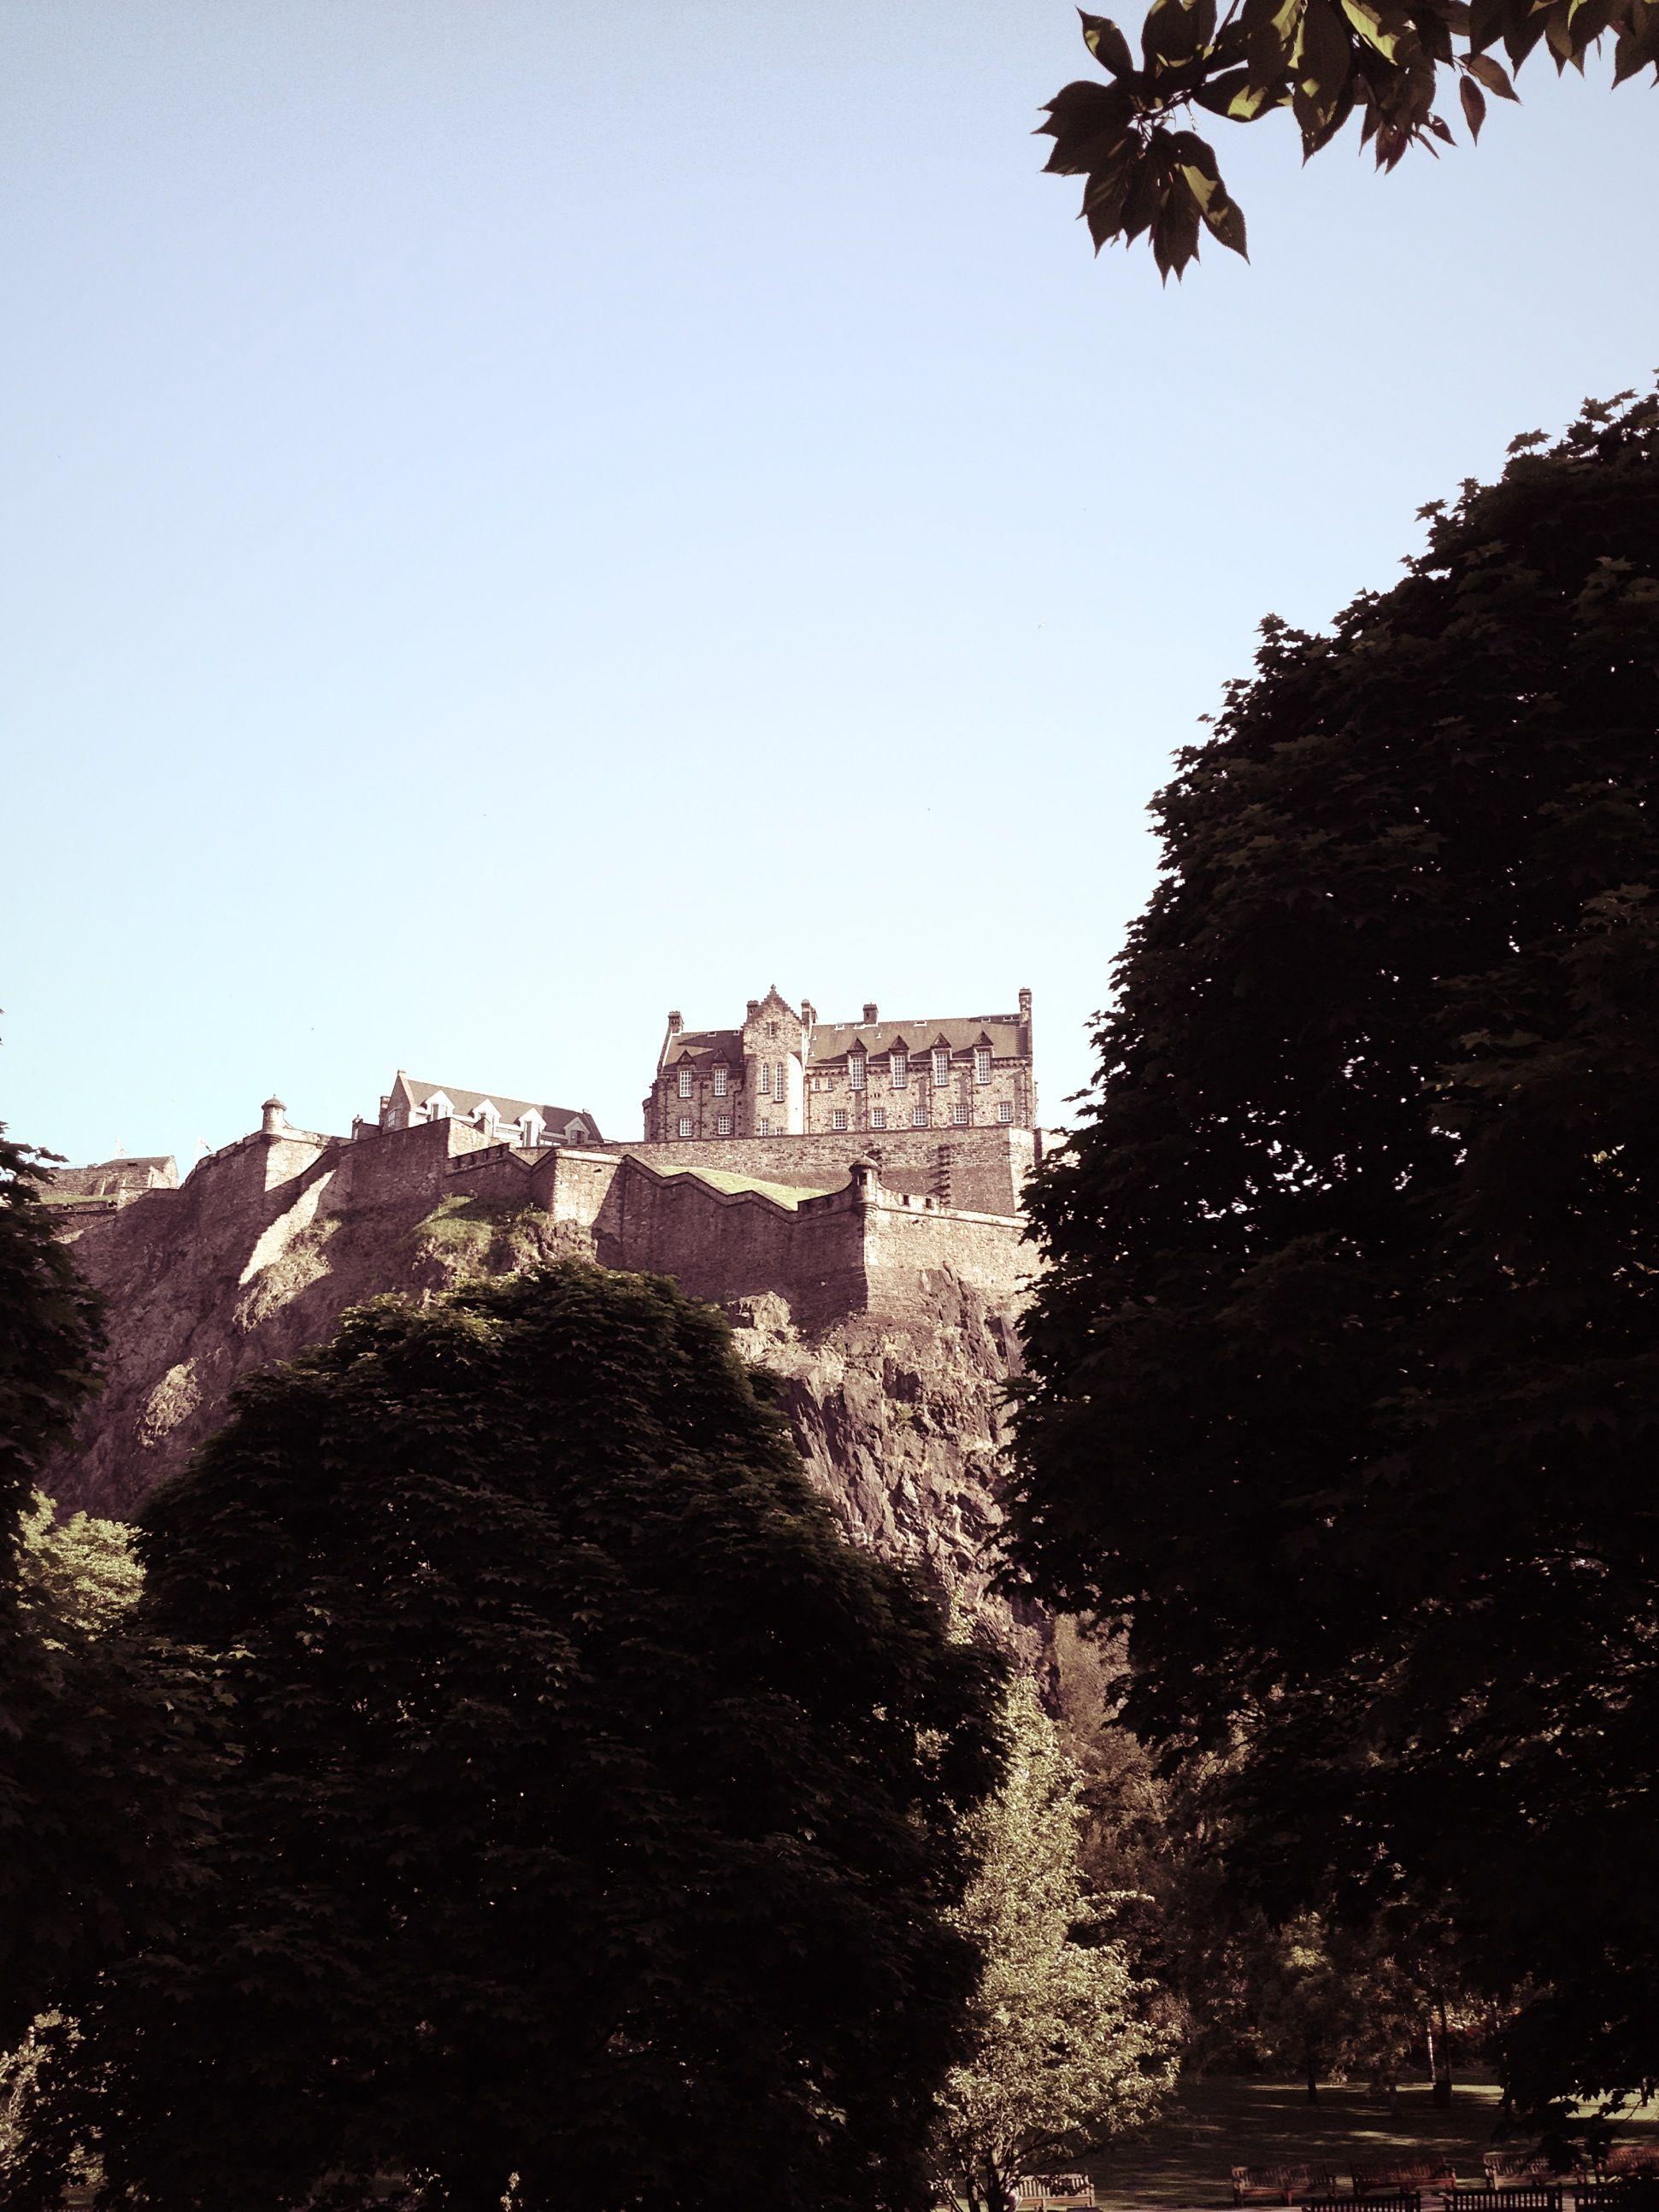 View of Edinburgh castle from the garden